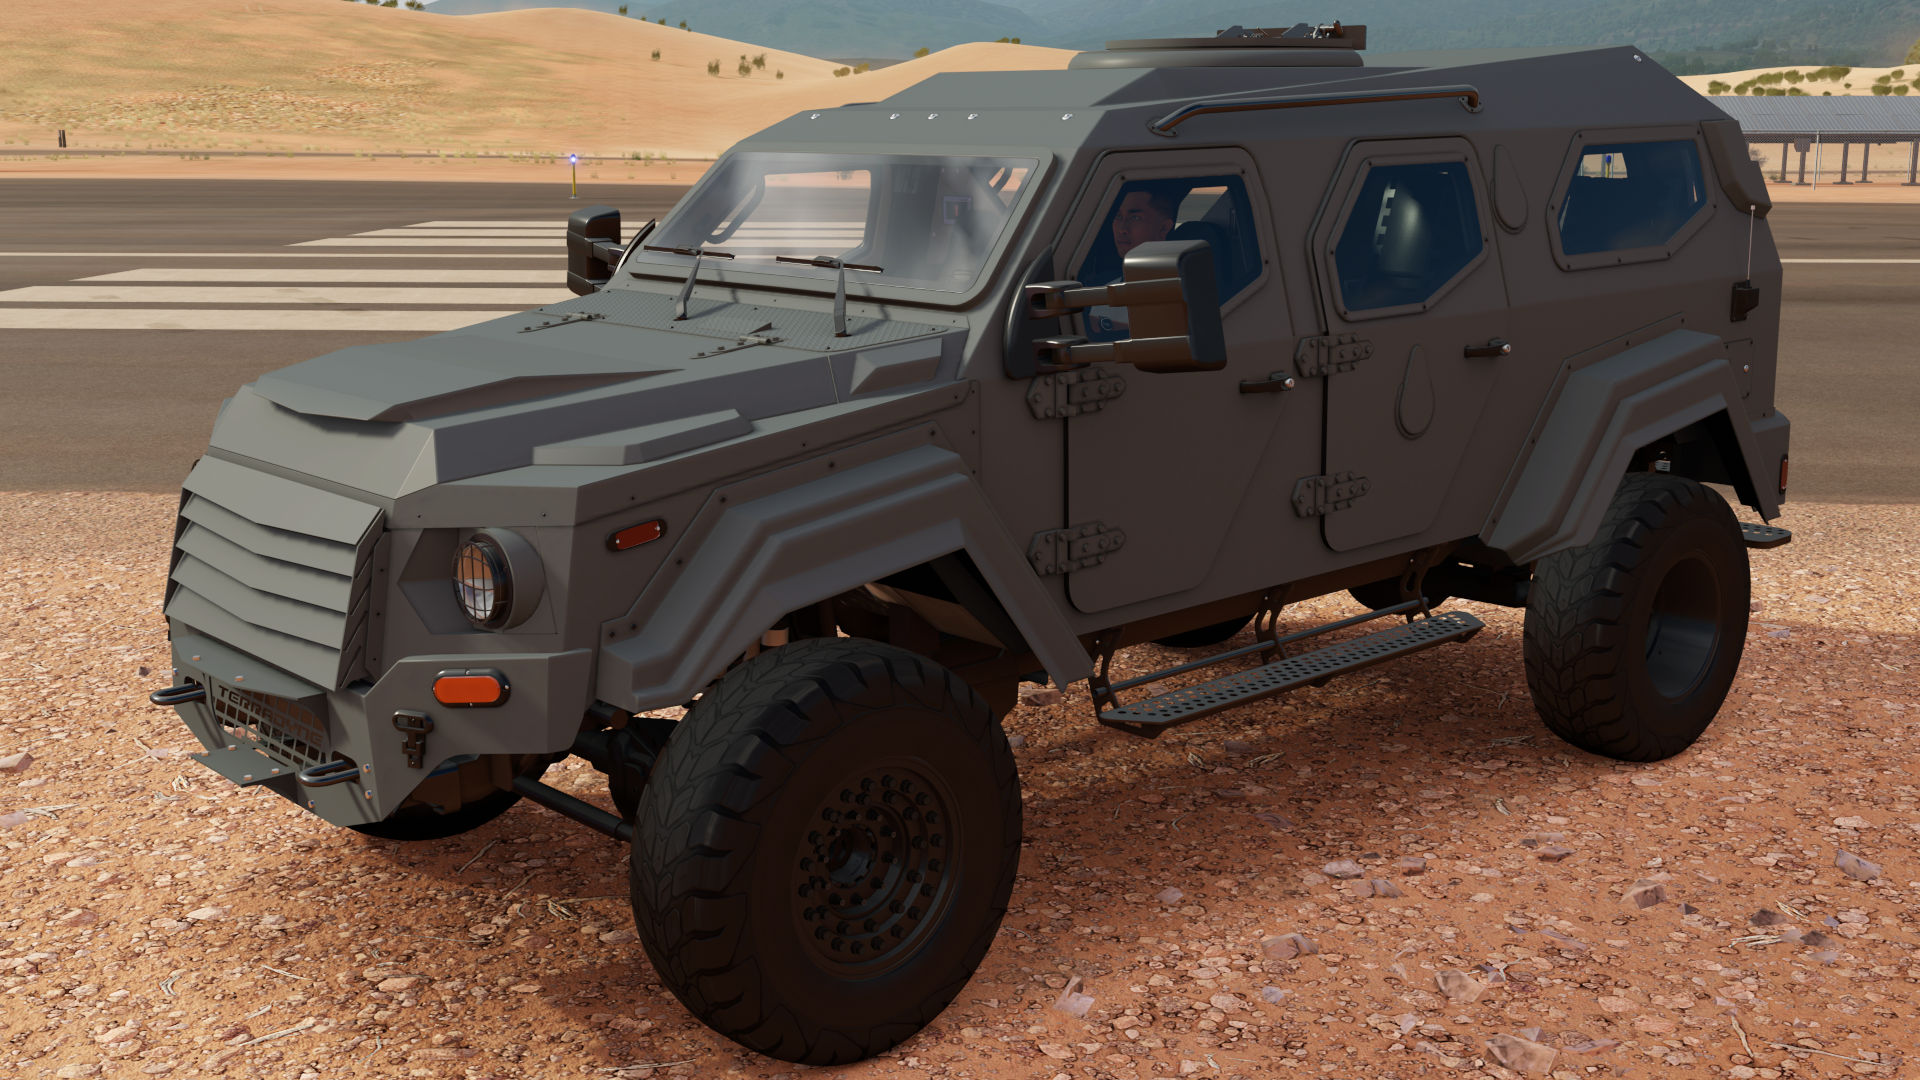 Terradyne Gurkha LAPV | Forza Motorsport Wiki | FANDOM powered by Wikia